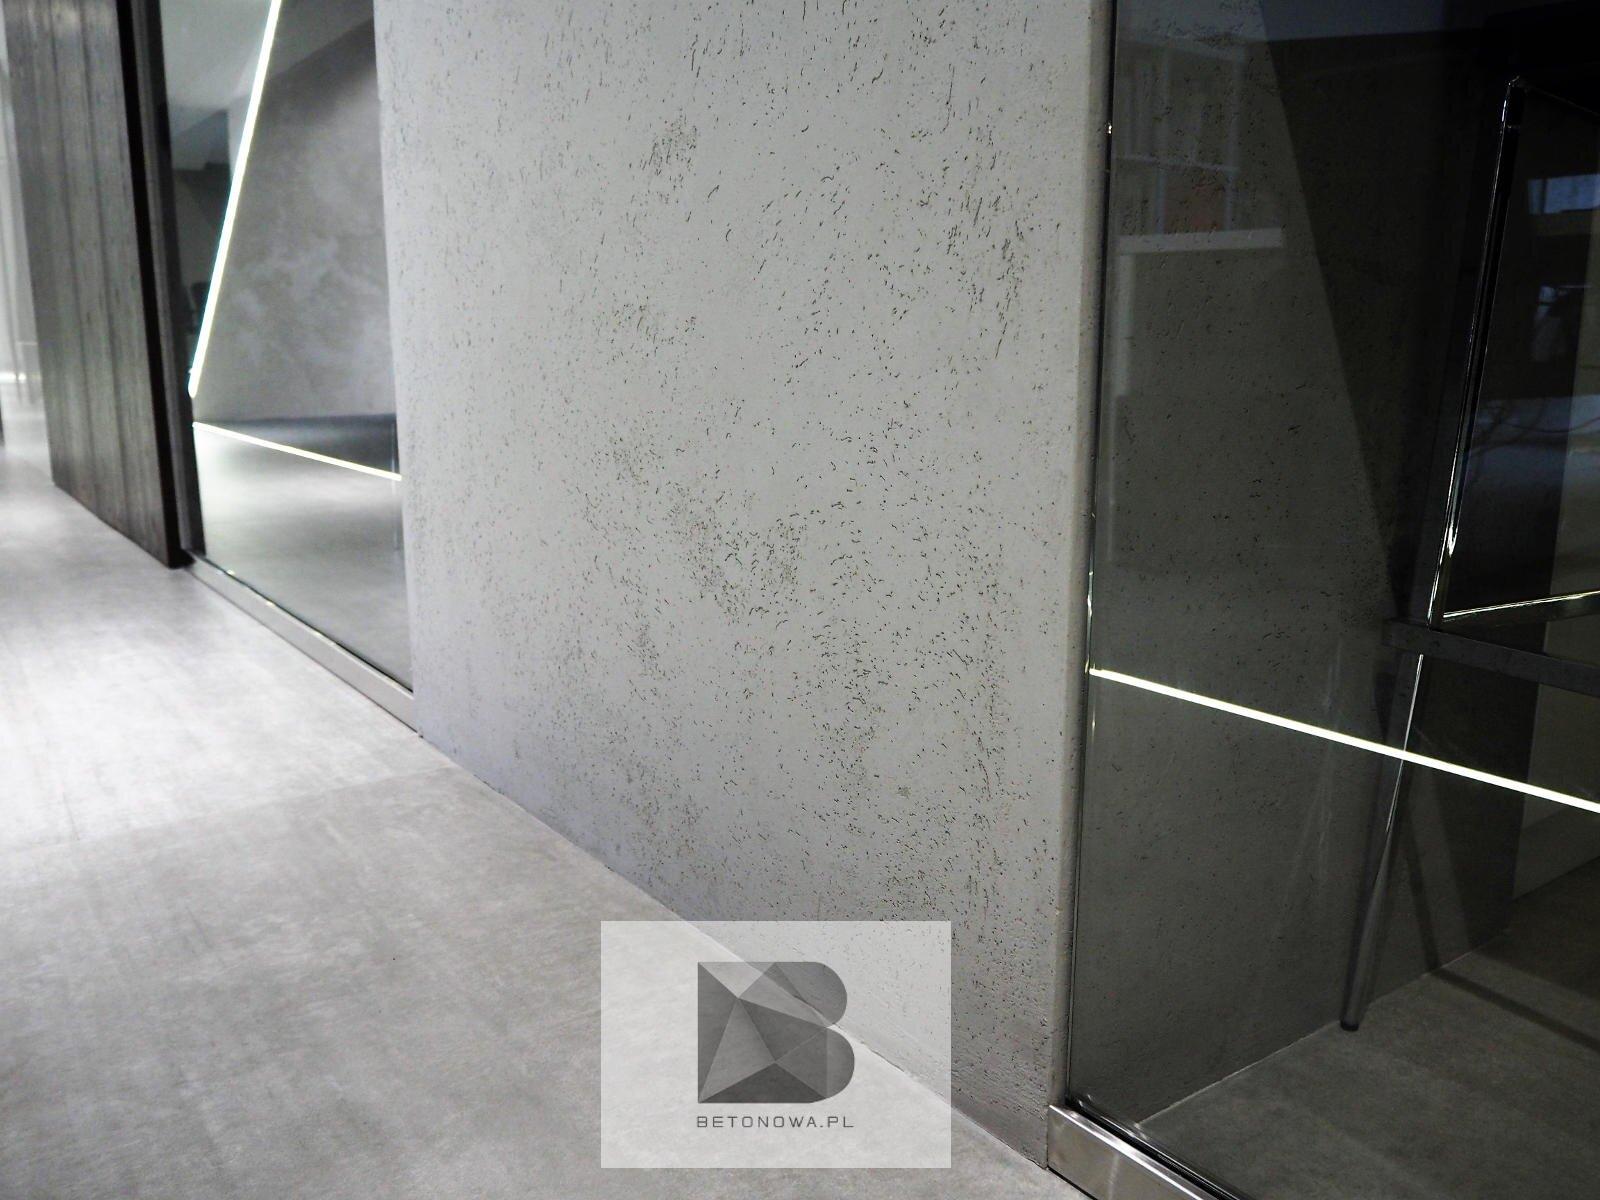 Beton Dekoracyjny Sciany Struktura Betonowa1